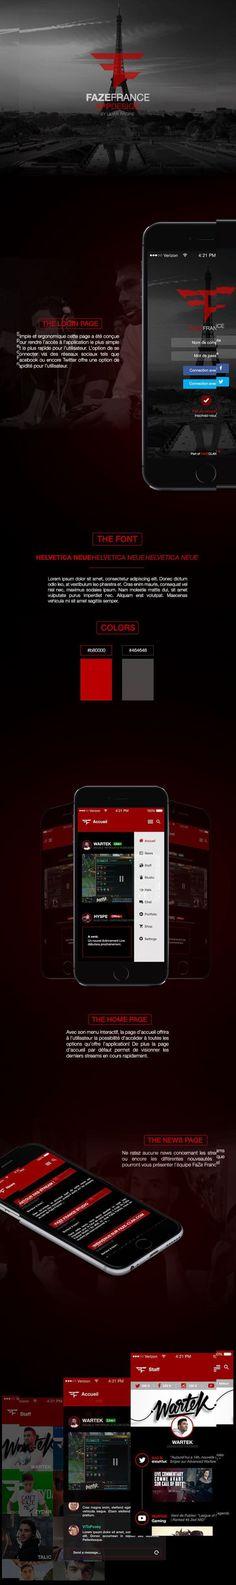 FaZe France – App Design by Lilian Racine